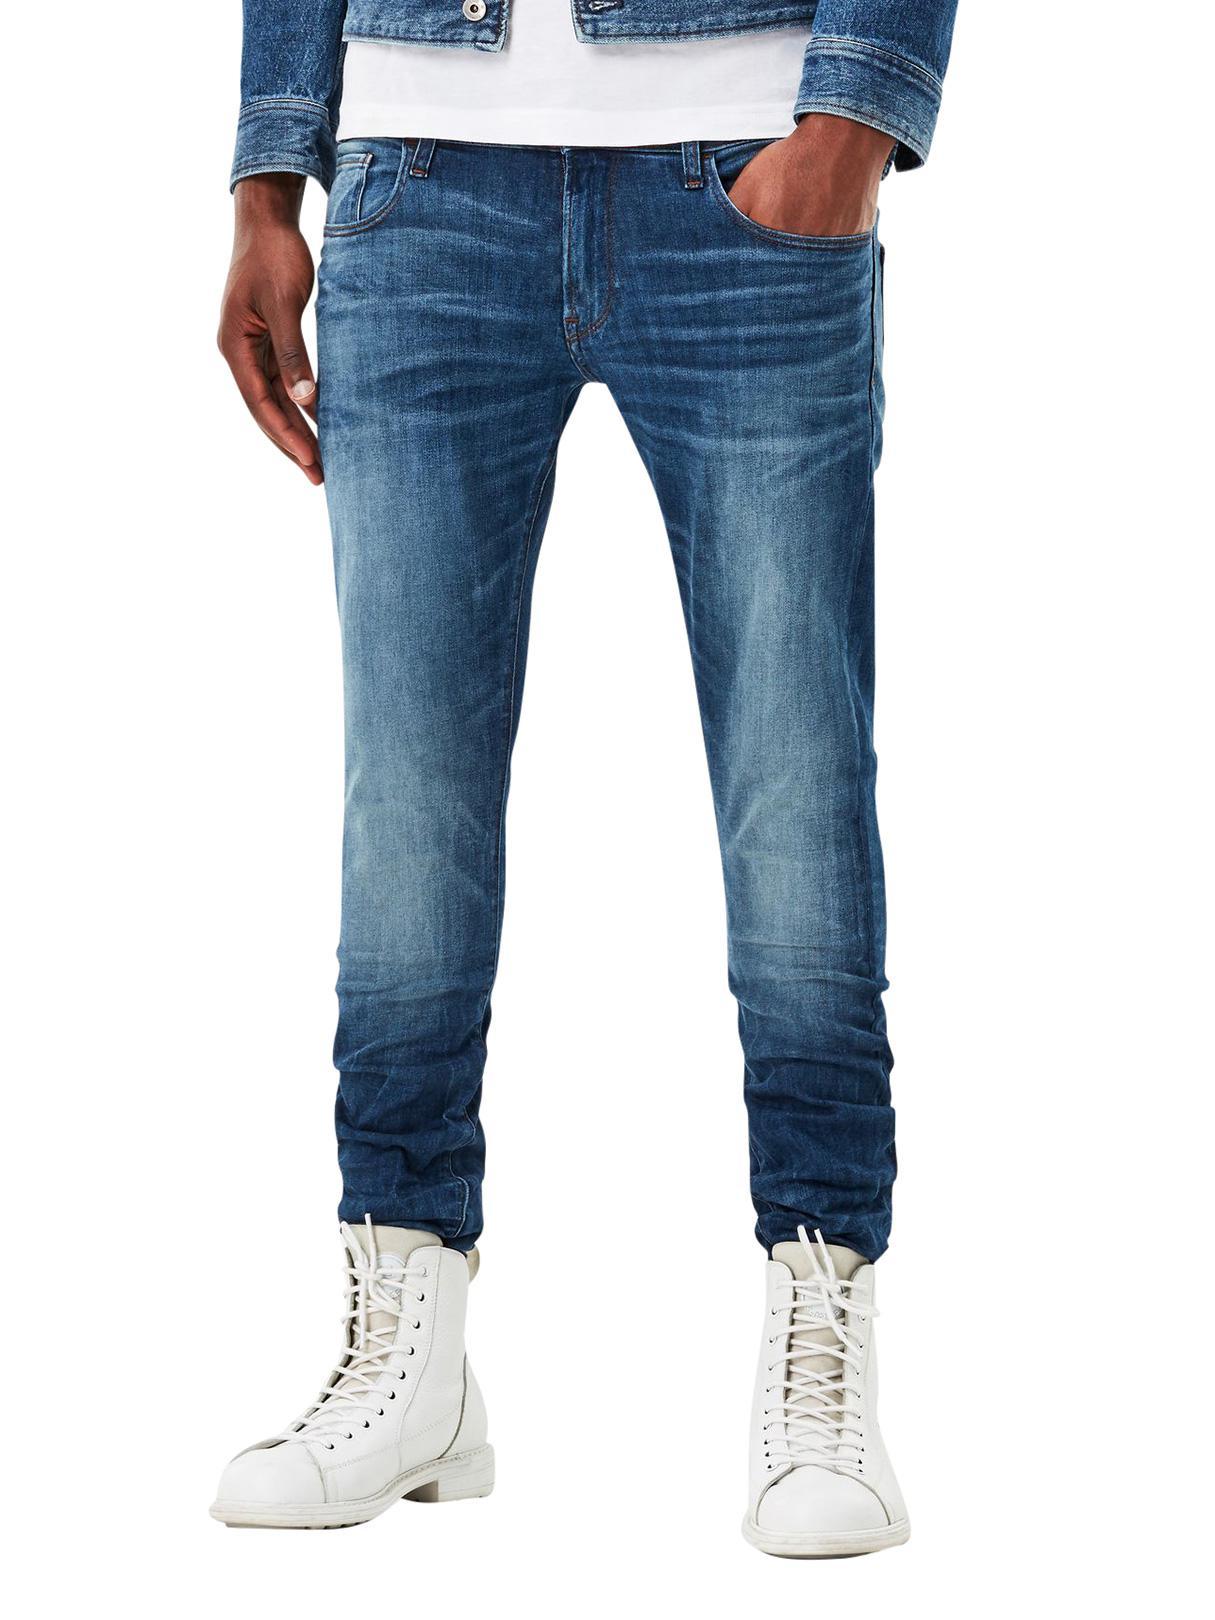 06491726343 G-Star RAW. Men's Blue Medium Indigo 3301 Deconstructed Super Slim Jeans